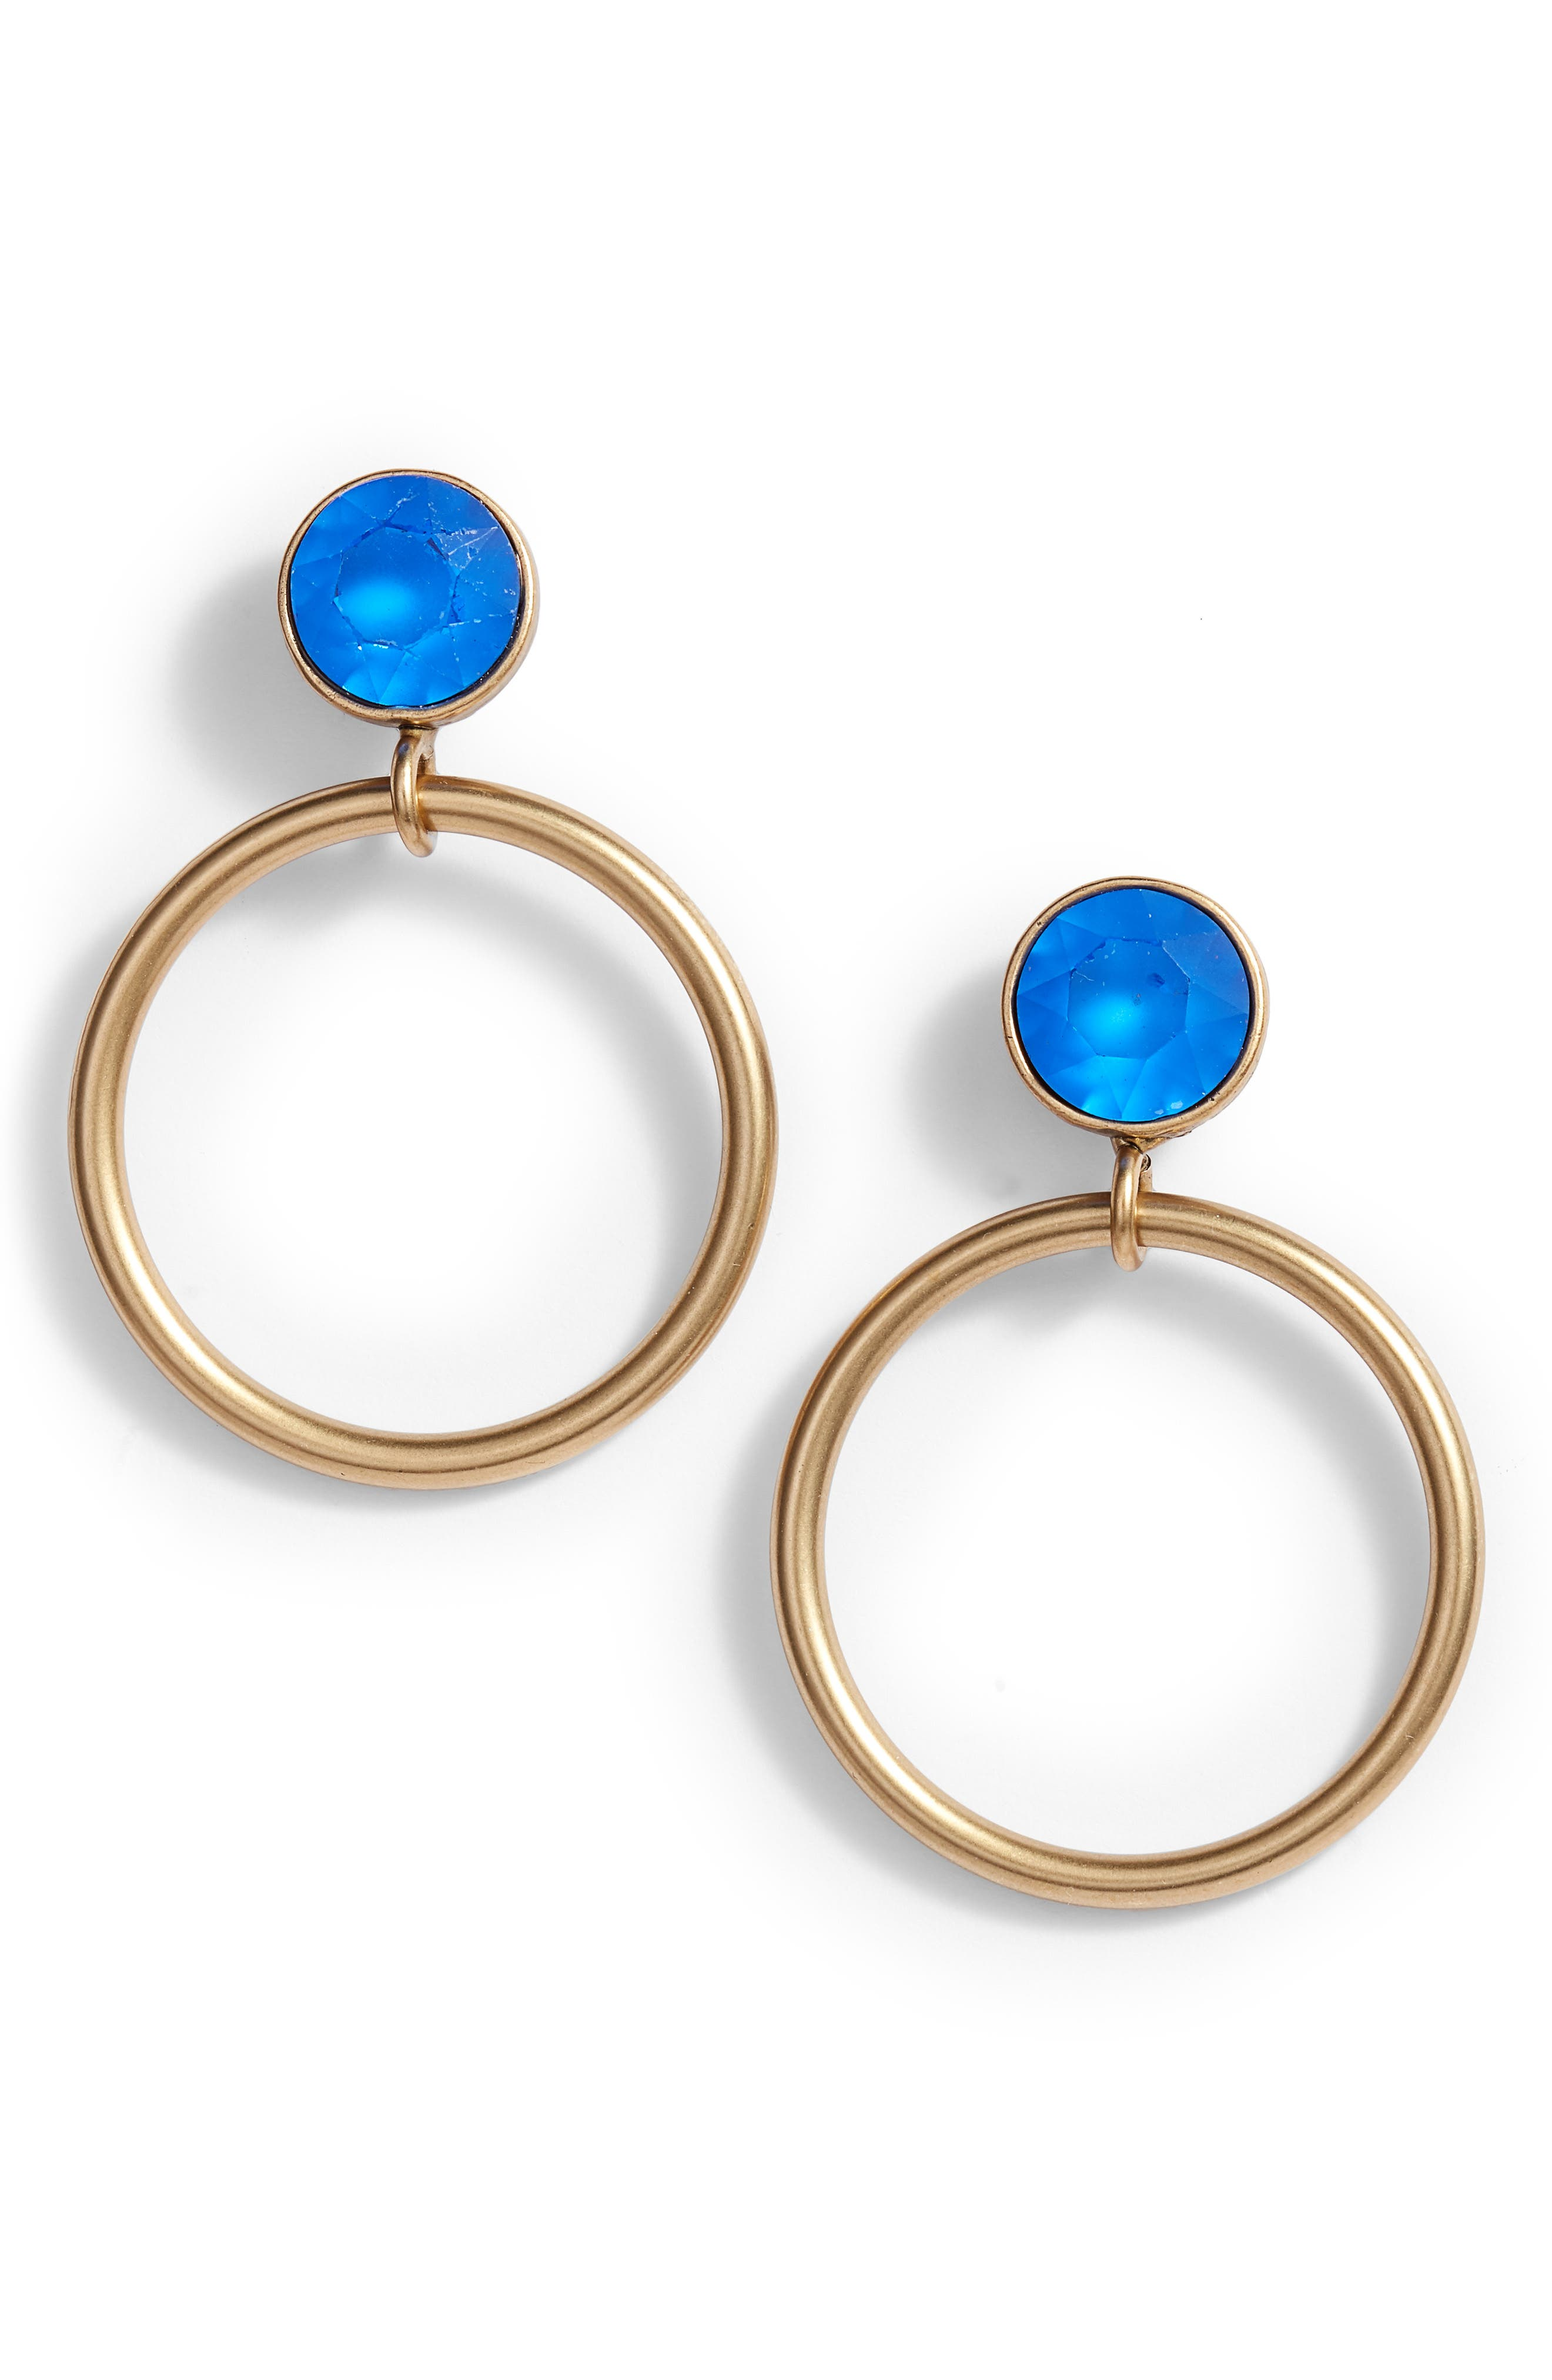 Cecelia Crystal Drop Hoop Earrings,                             Main thumbnail 1, color,                             SAPPHIRE